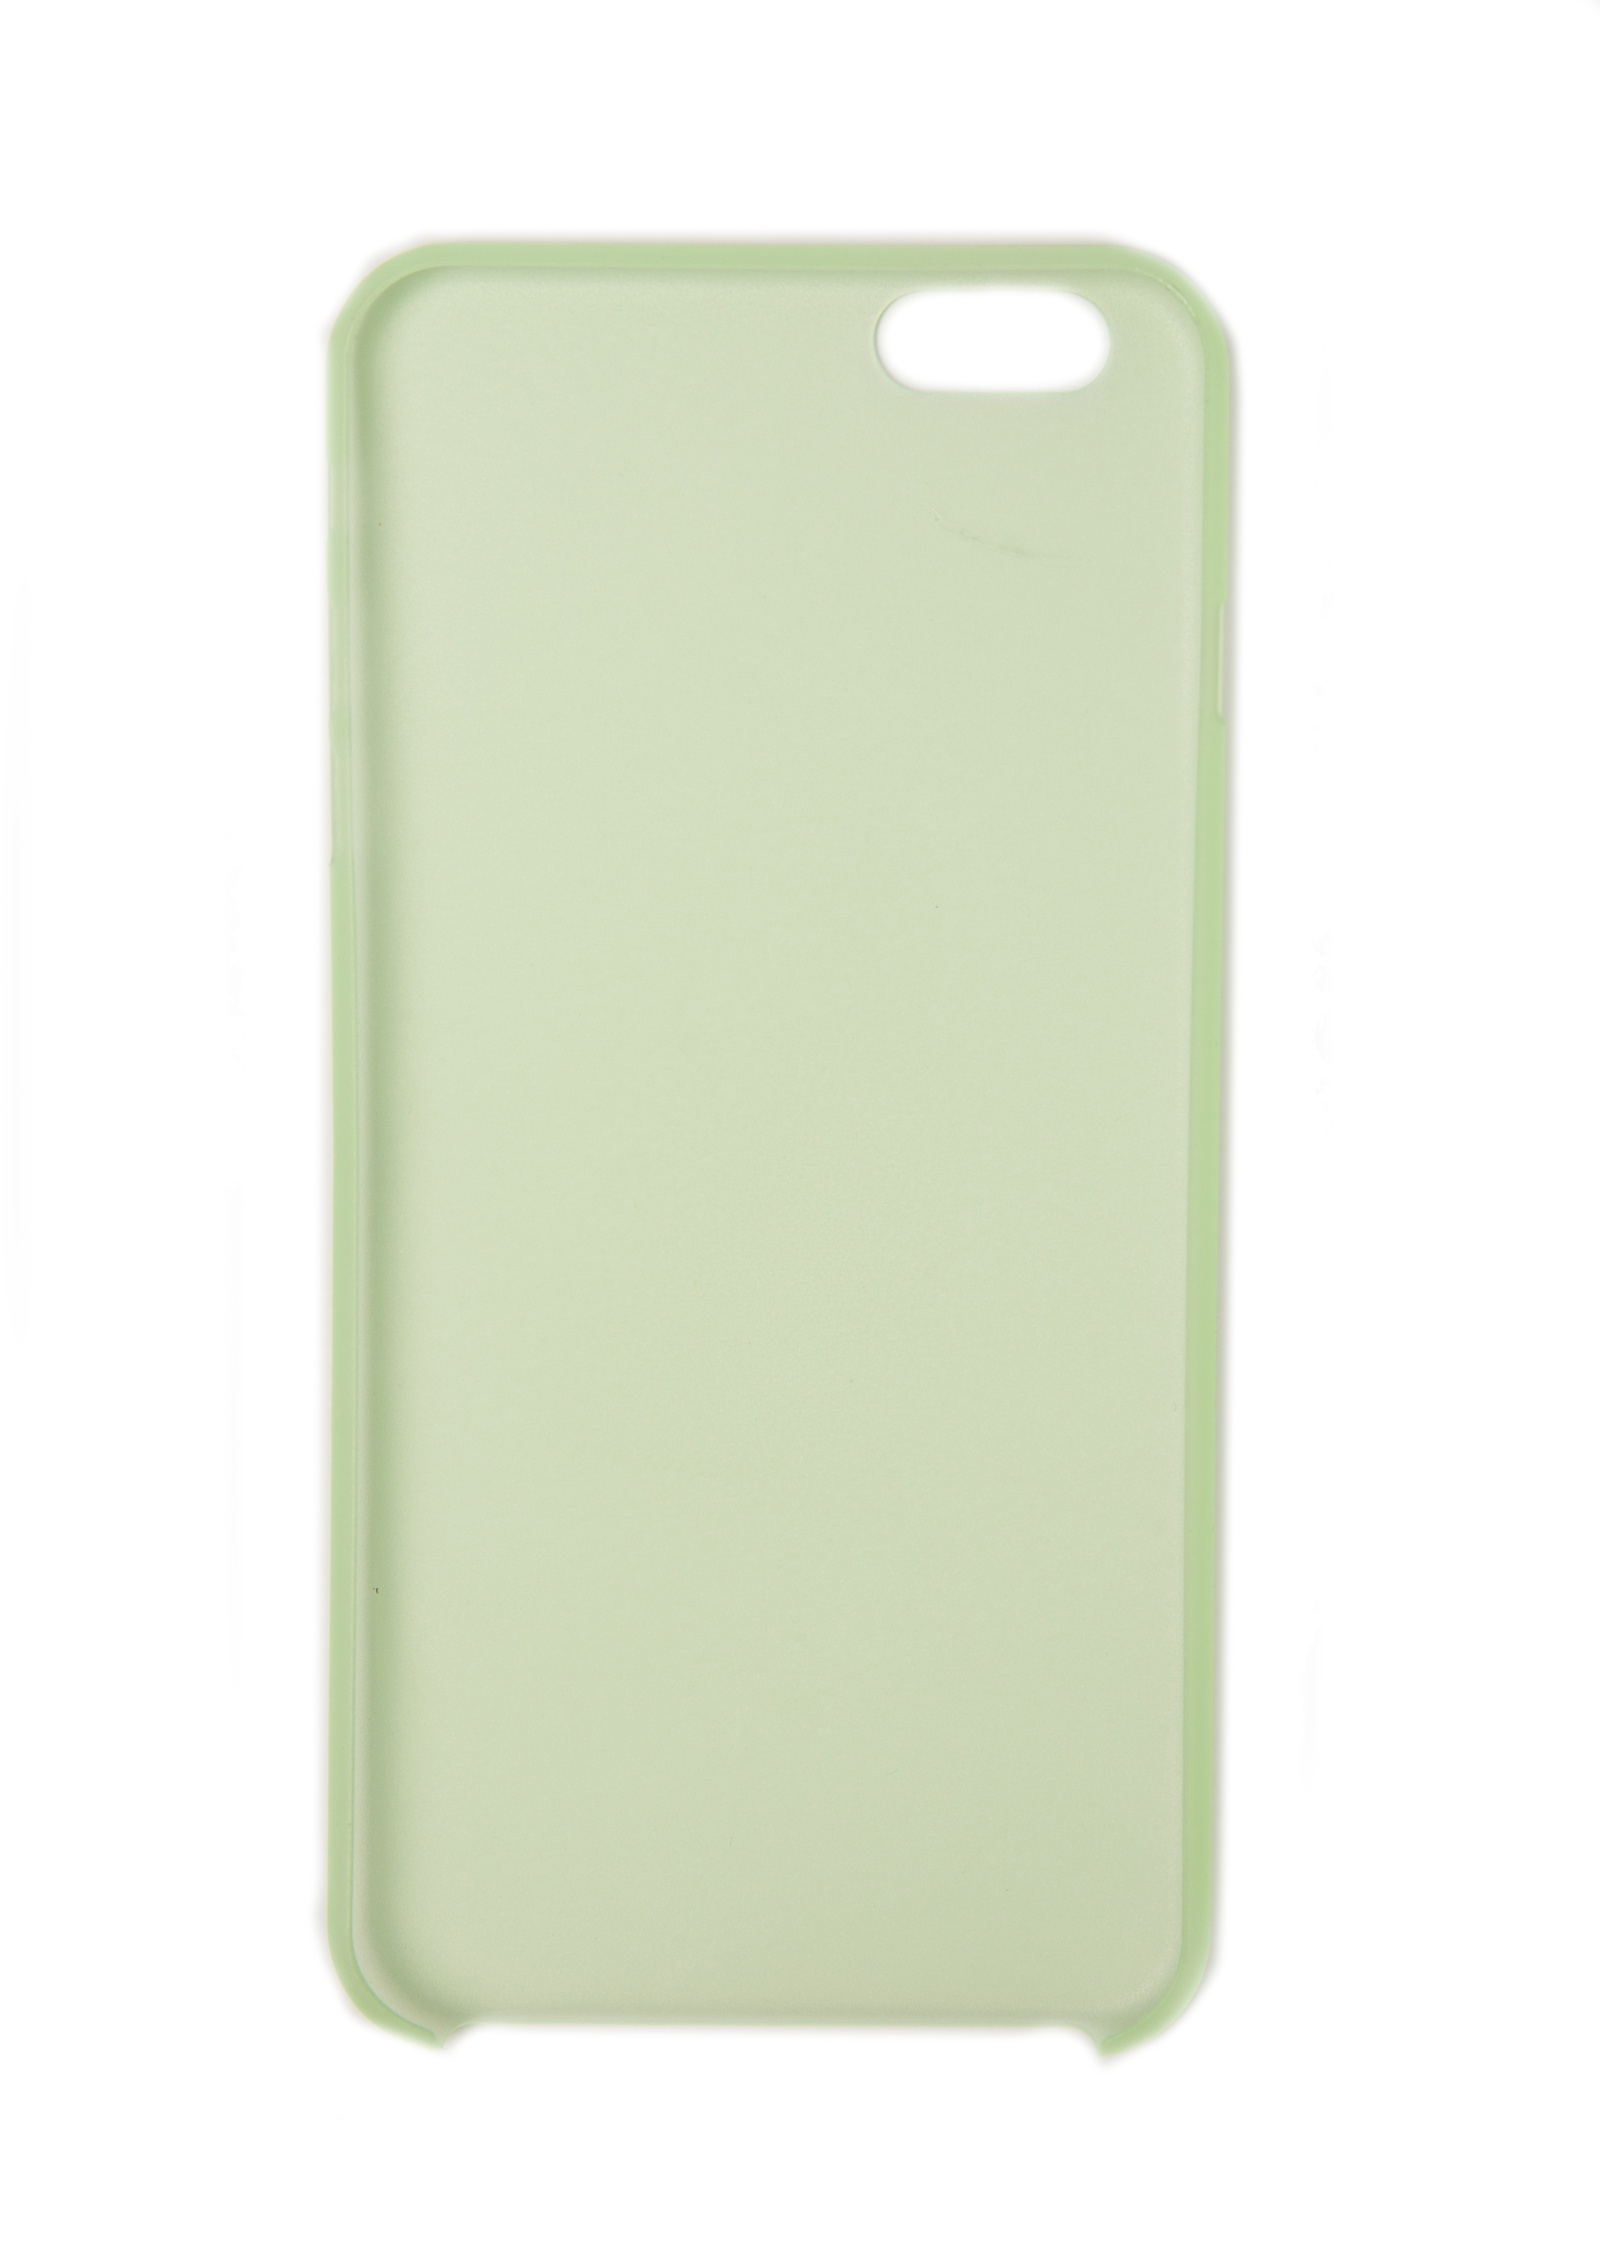 Чехол для сотового телефона Mitya Veselkov CASE, IP6.МITYA-233PVC все цены